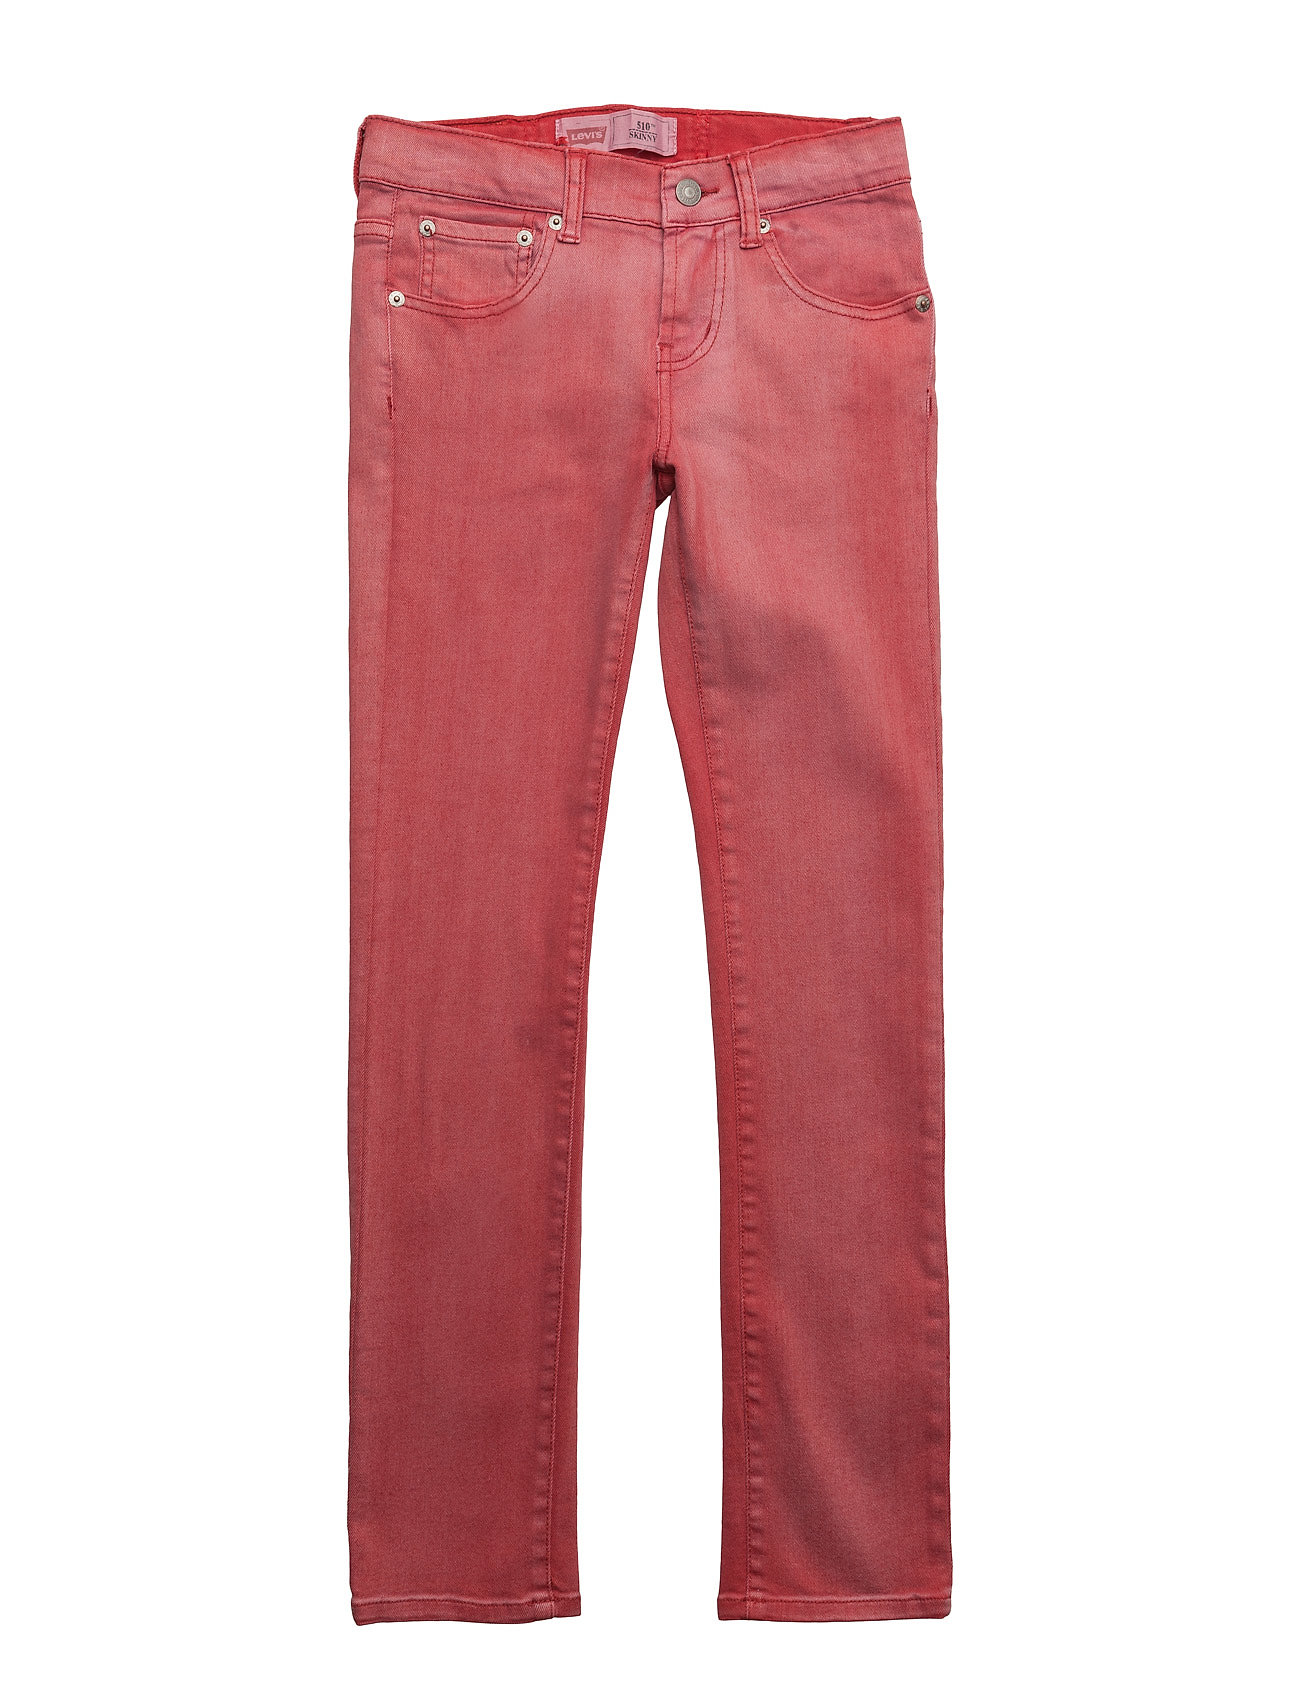 Pant 510 Levi's Kids Jeans til Drenge i